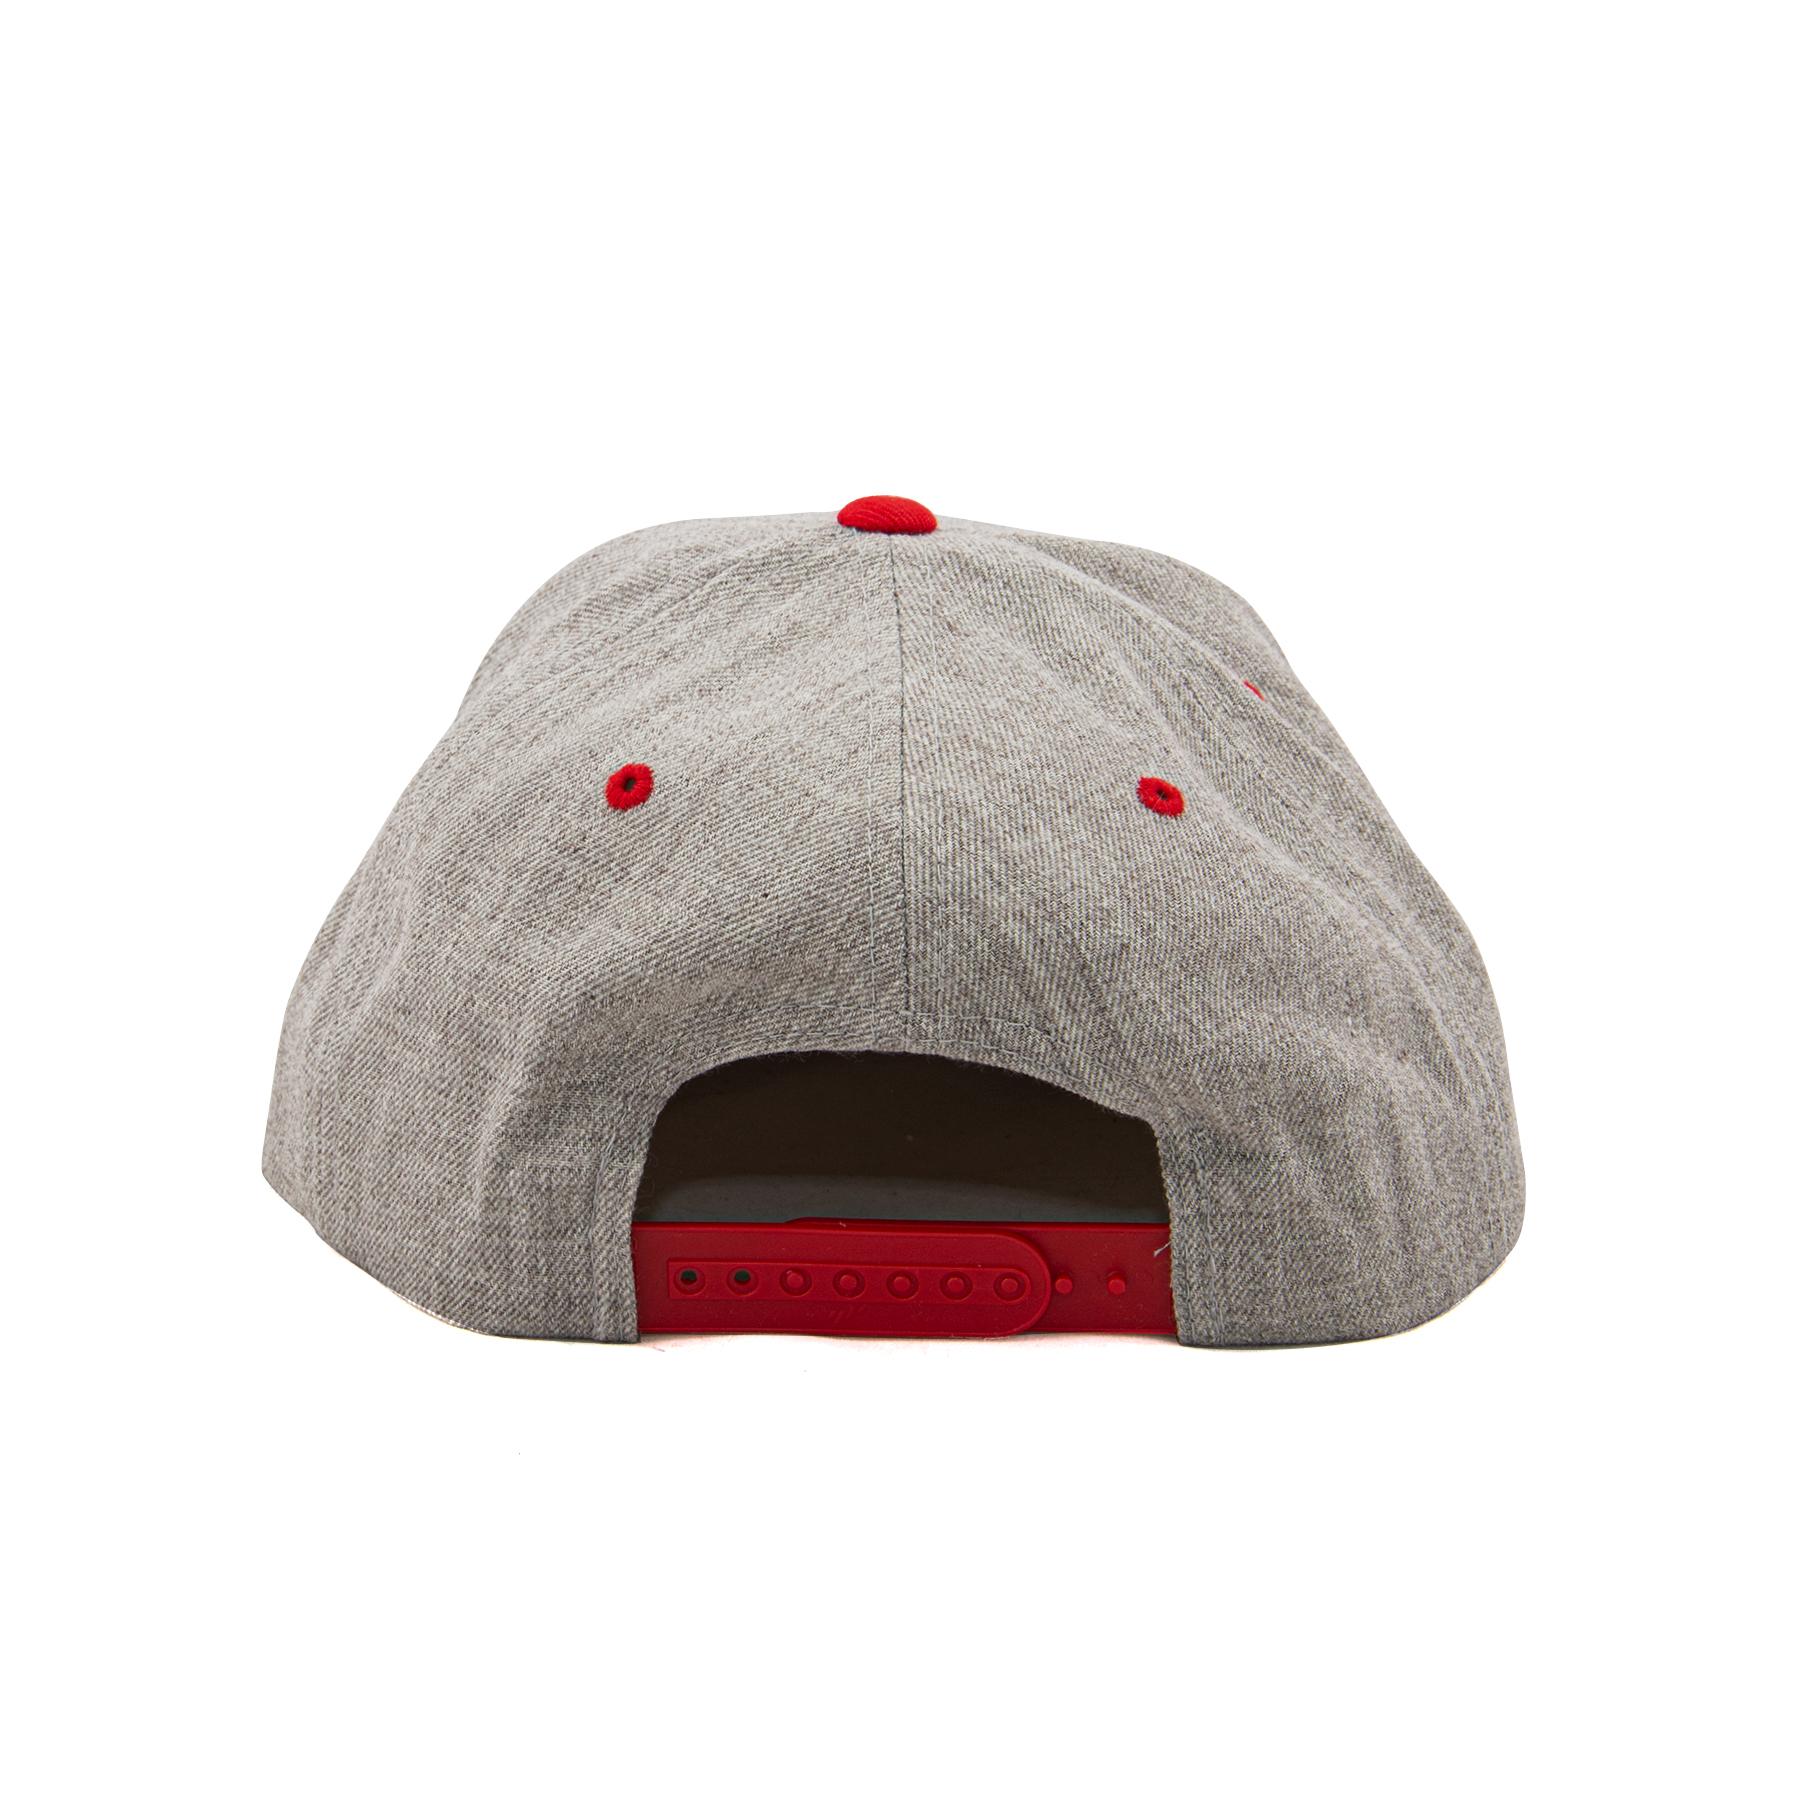 light gray snapback hat back